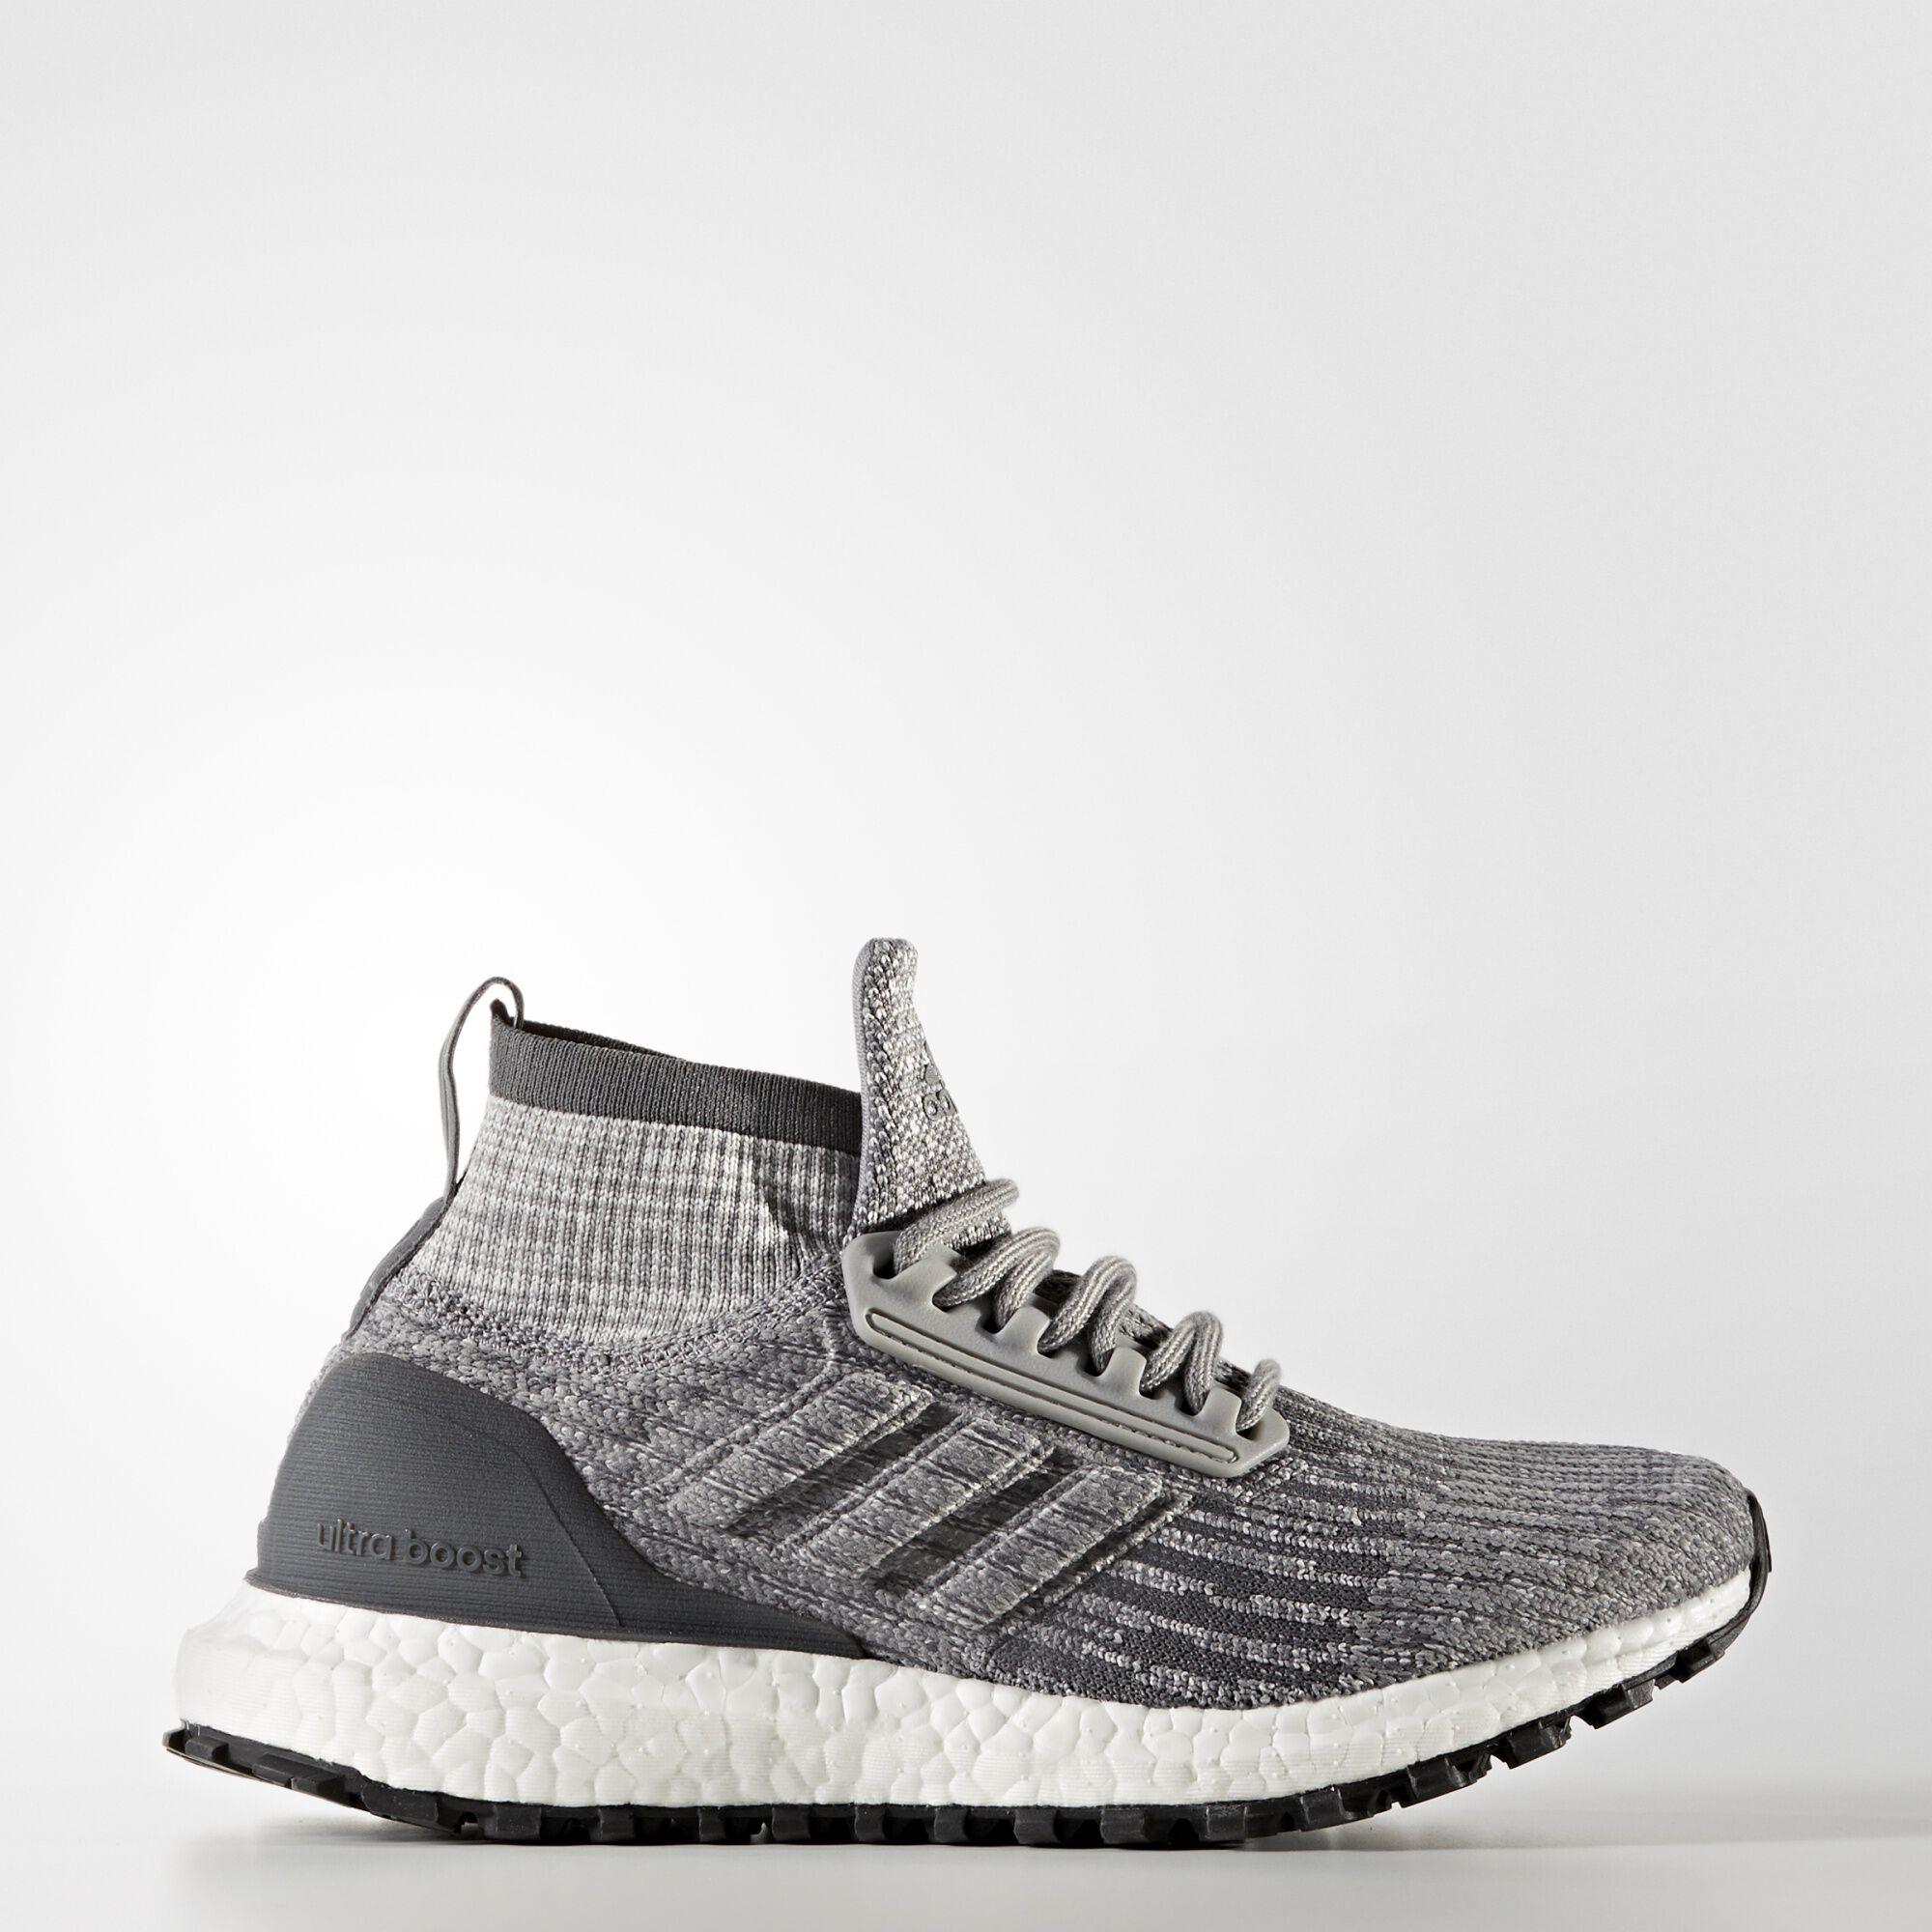 Adidas Neo Gs Adidas Court Attitude Shoes Black Casual White Sale Price